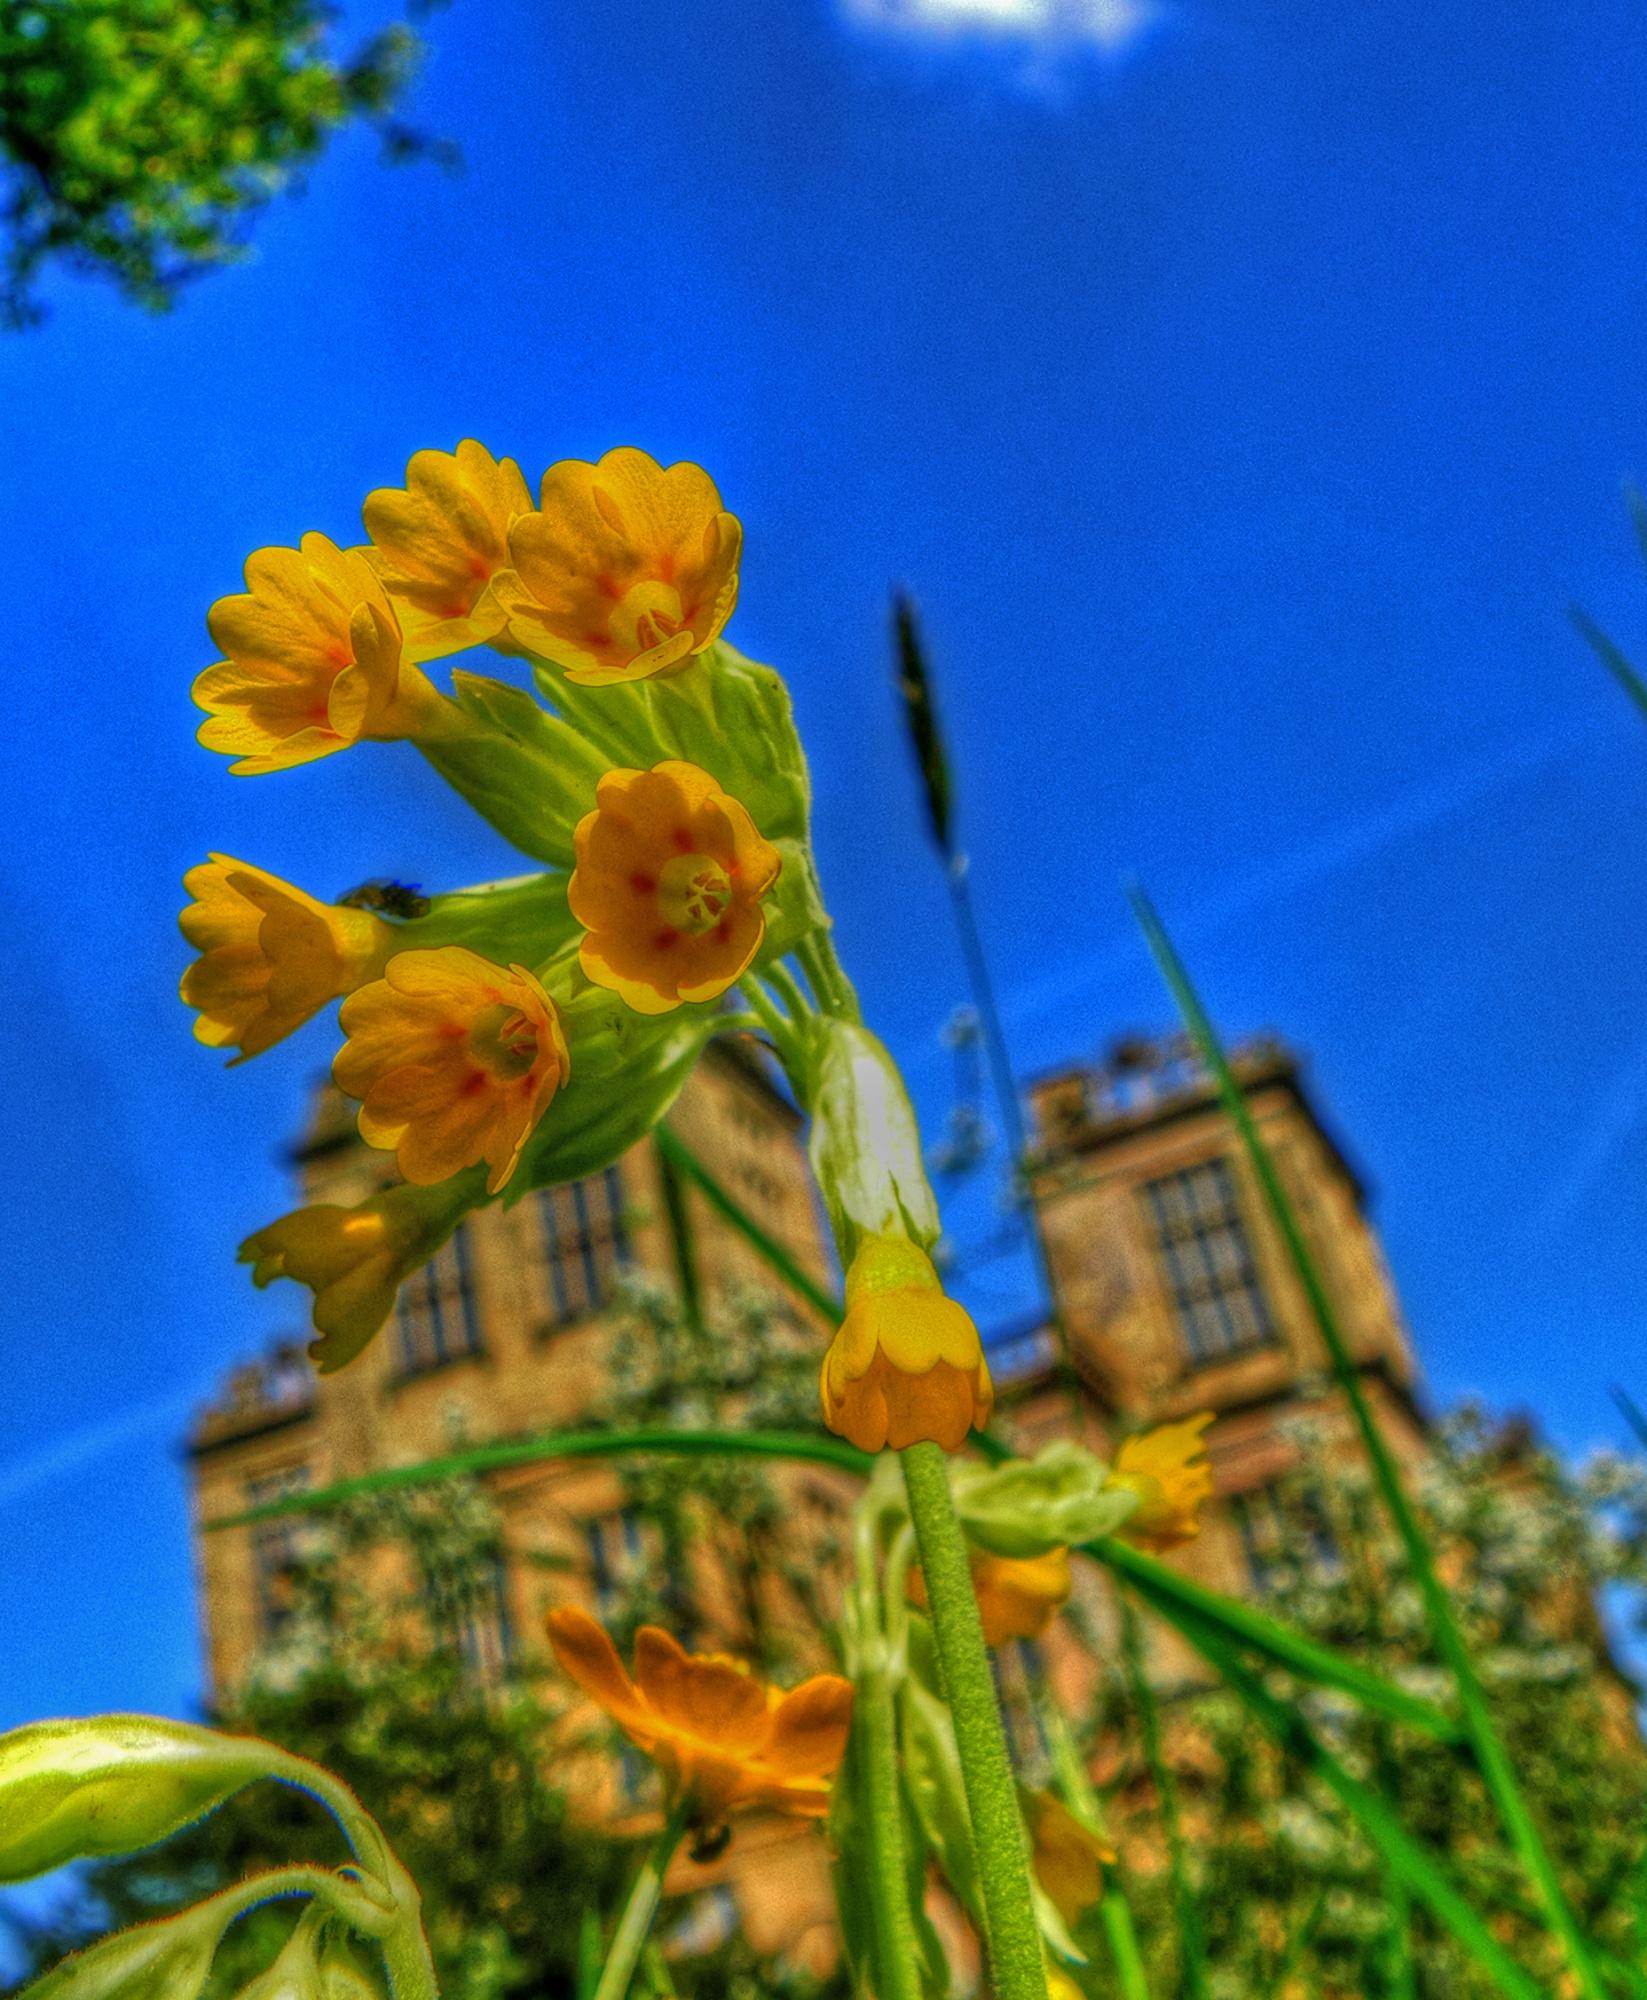 Flowers at Hardwick Hall